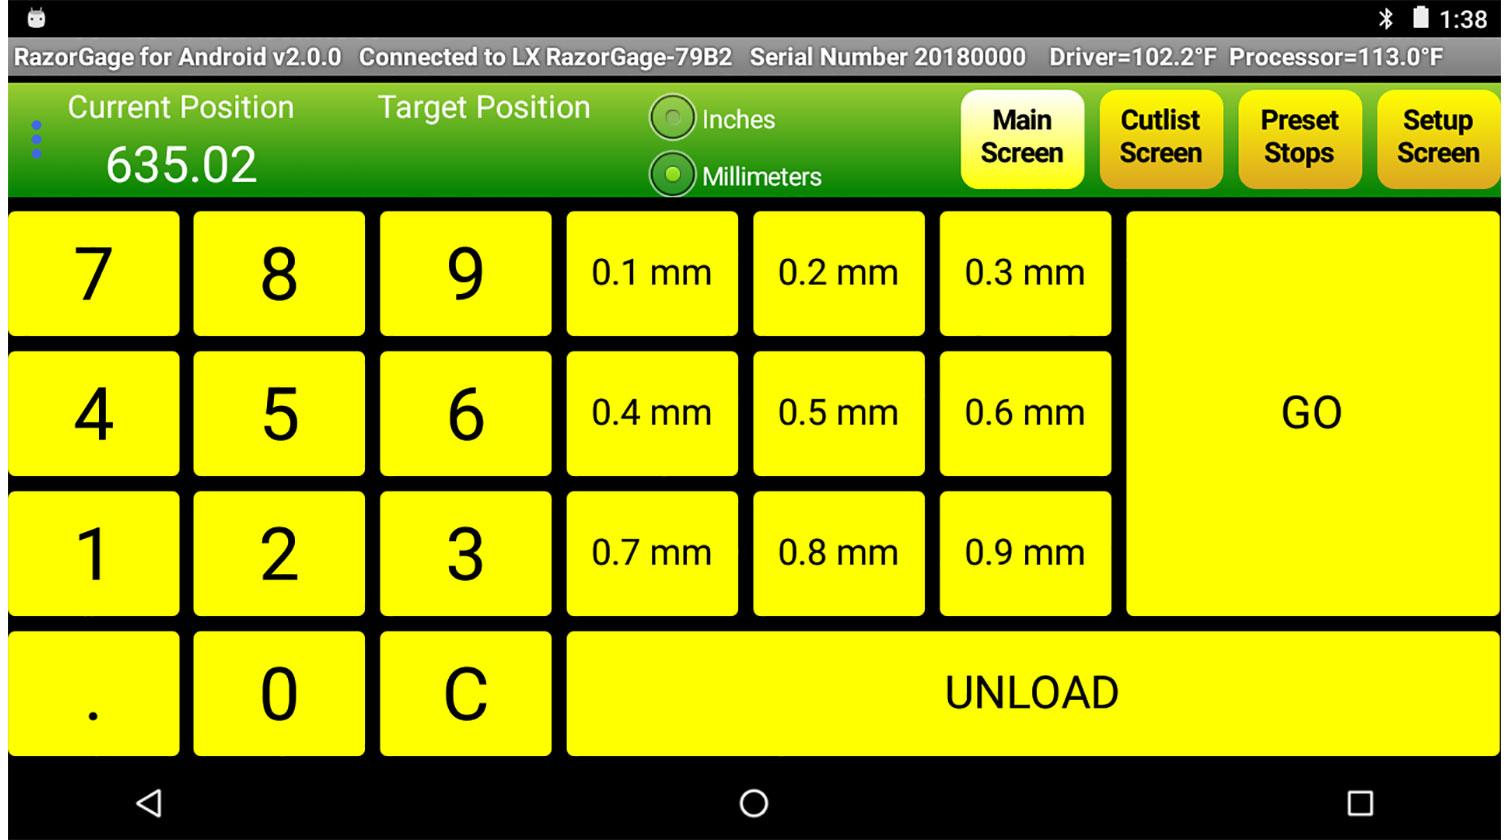 INT aluminum positioner RazorGage xT Android main screen mm